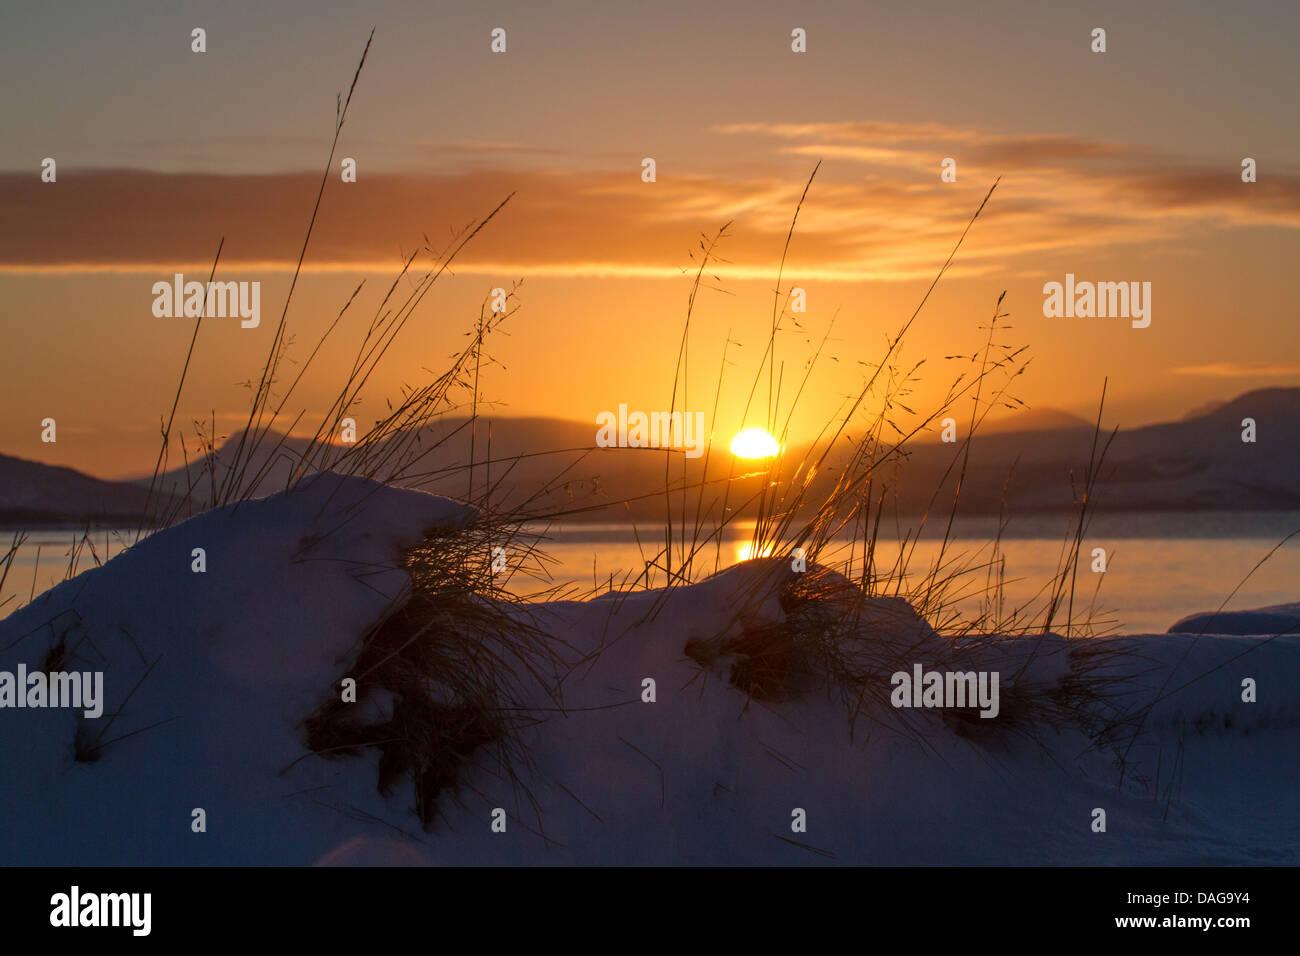 sun rise after polar night, Norway, Troms, Tromsoe - Stock Image